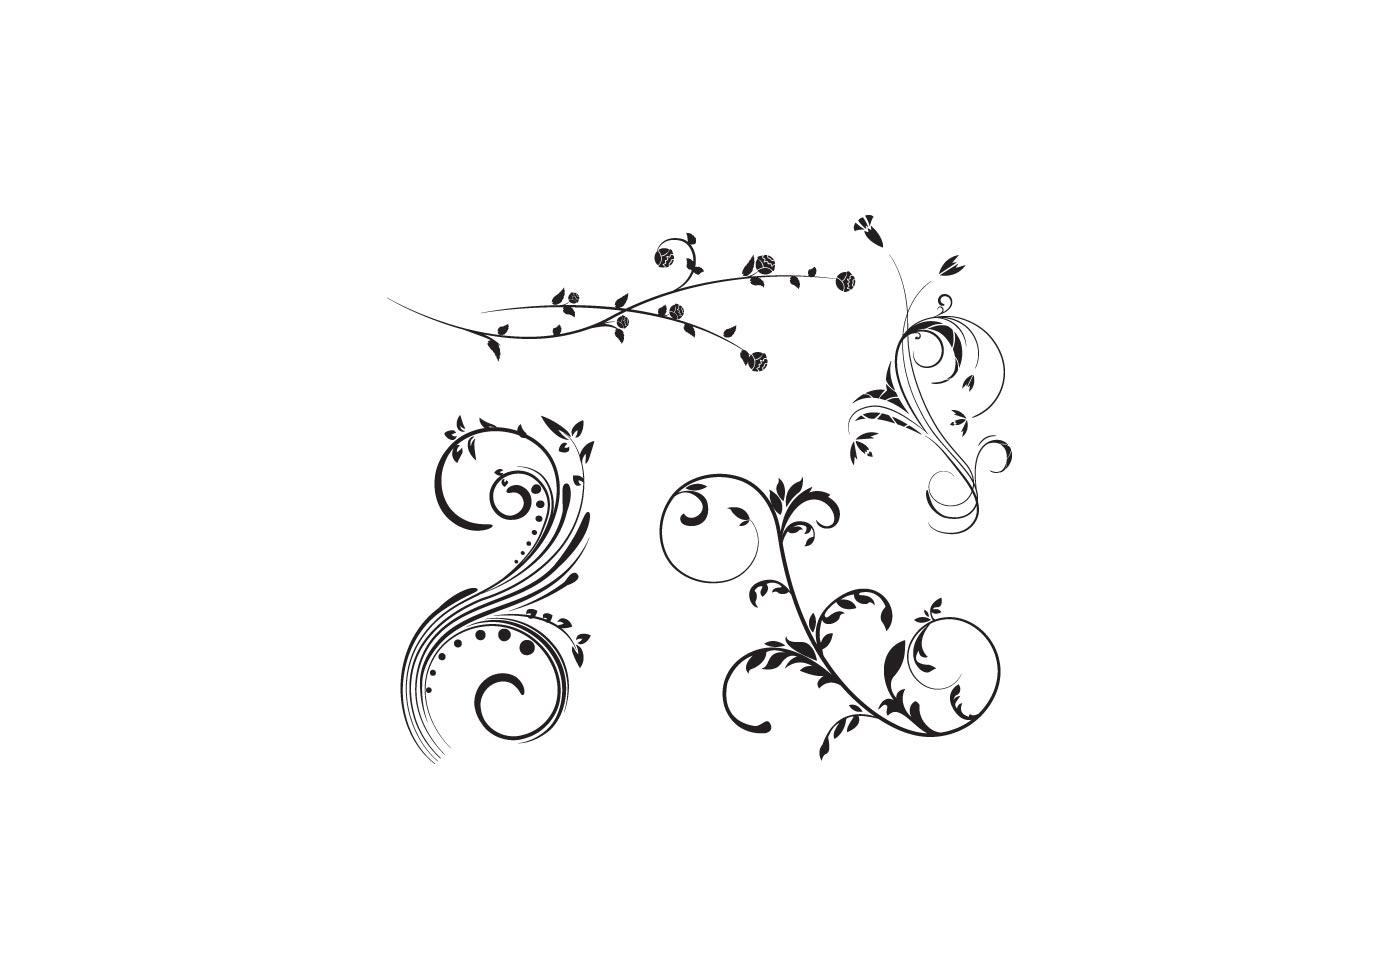 Flourish Free Vector Art - (12206 Free Downloads)